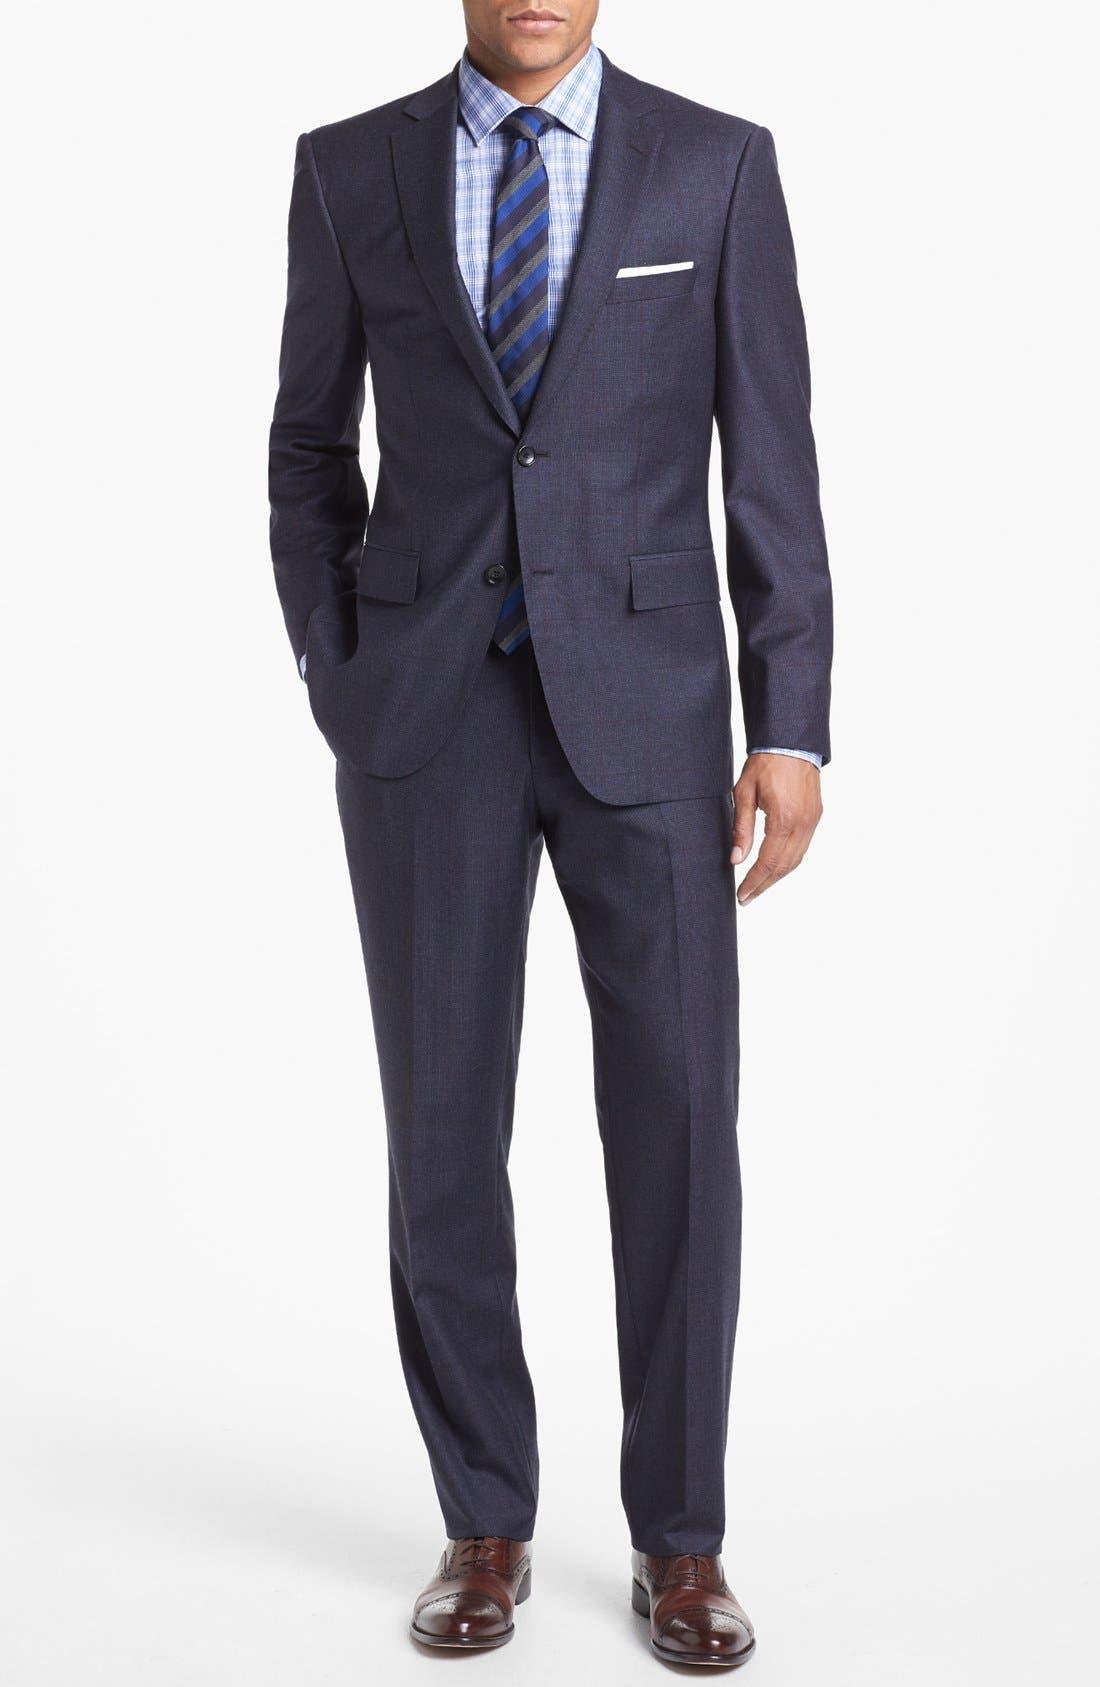 Alternate Image 1 Selected - BOSS HUGO BOSS 'Howard/Court' Trim Fit Plaid Suit